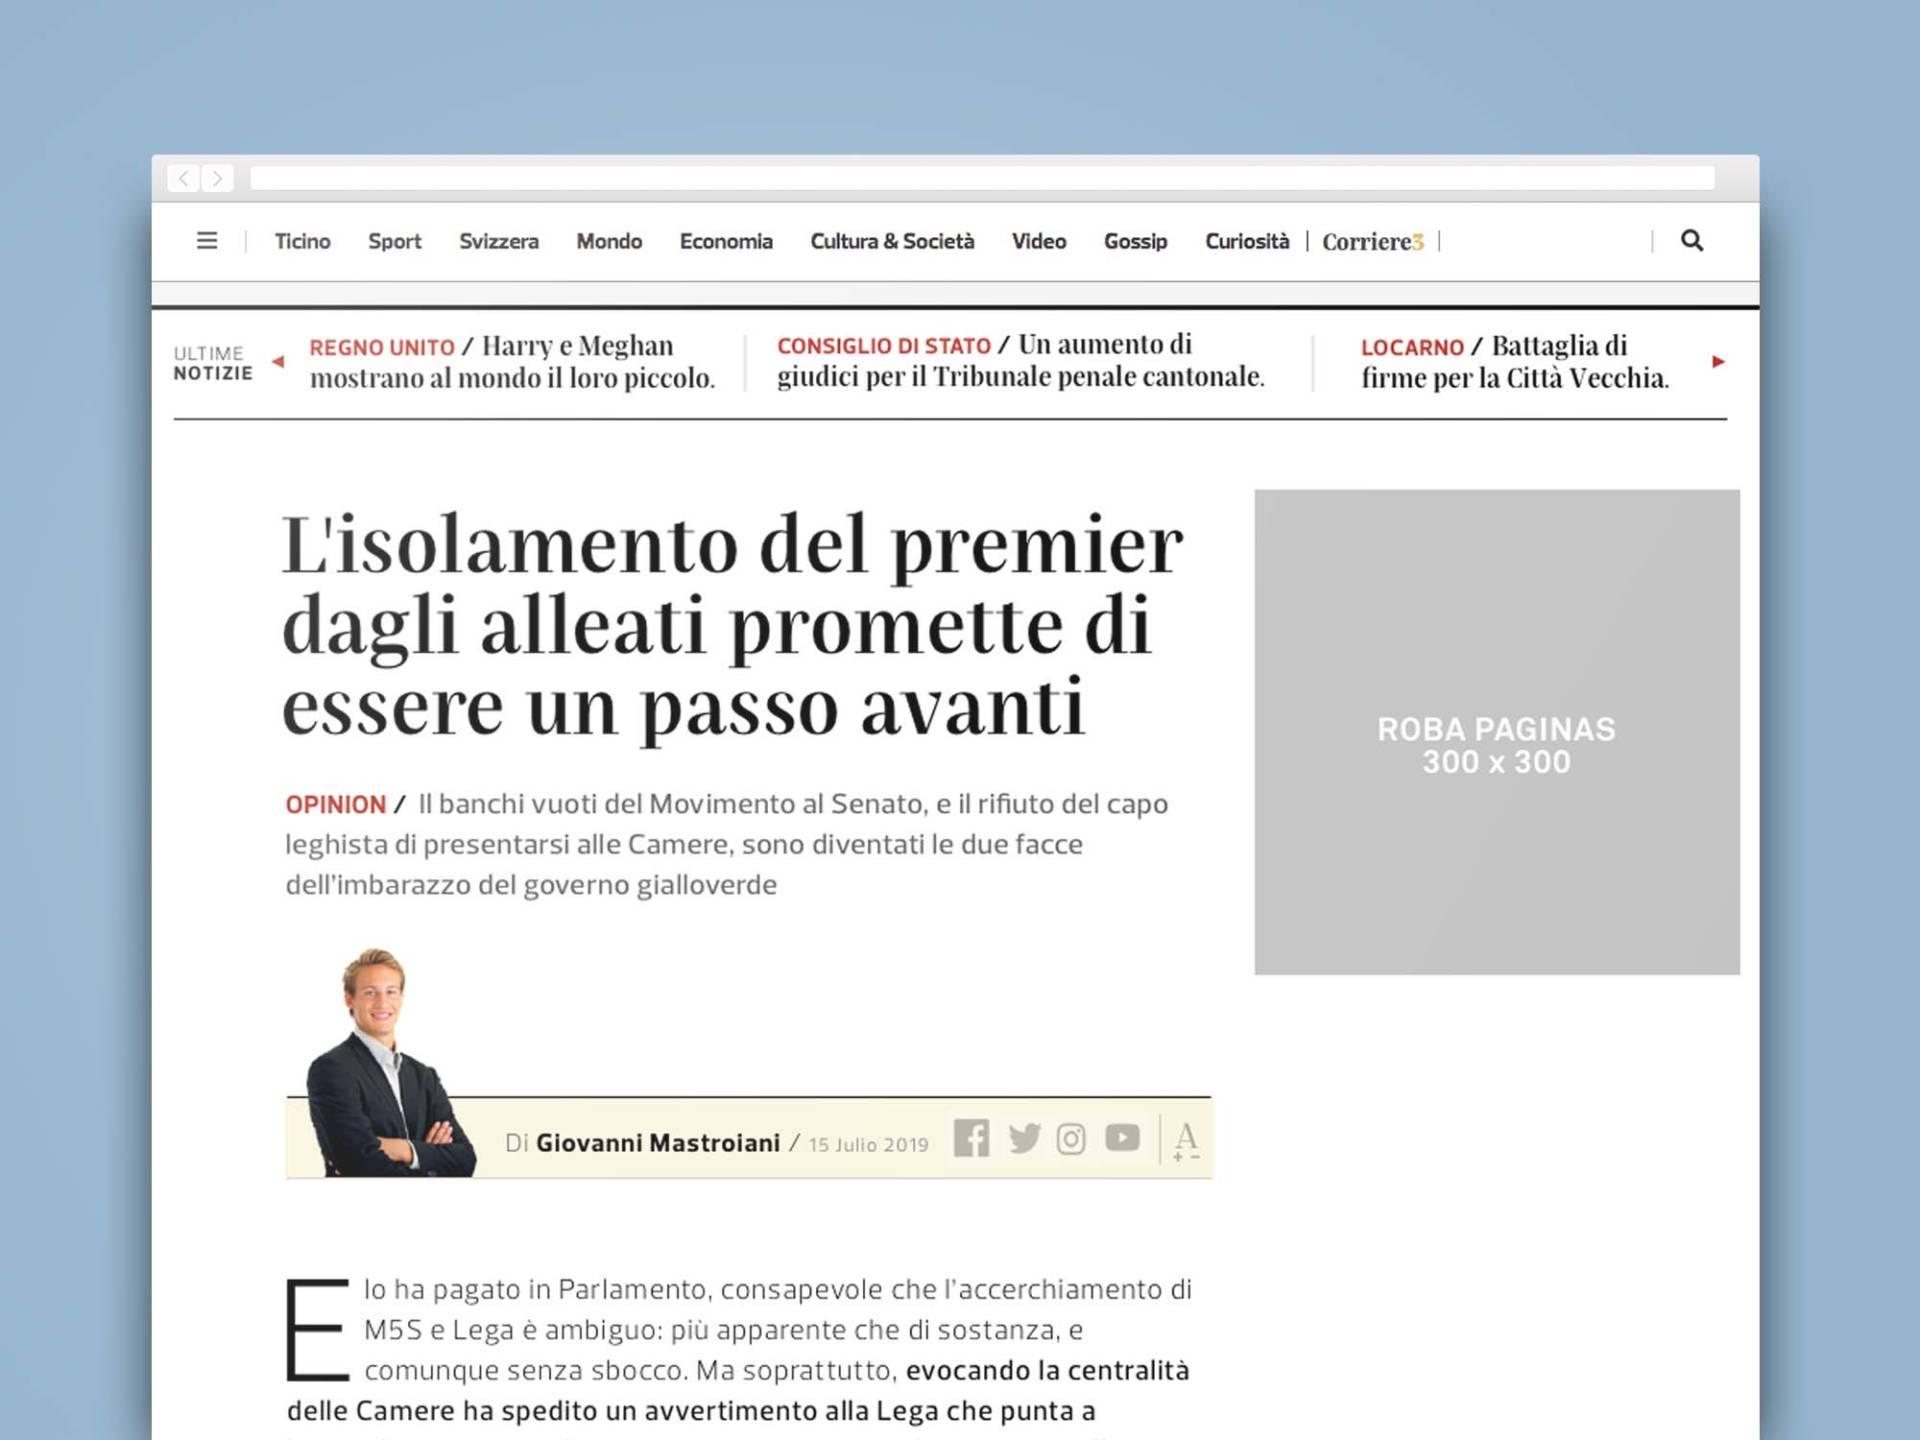 Corriere_del_Ticino web_06_Wenceslau_News_Design